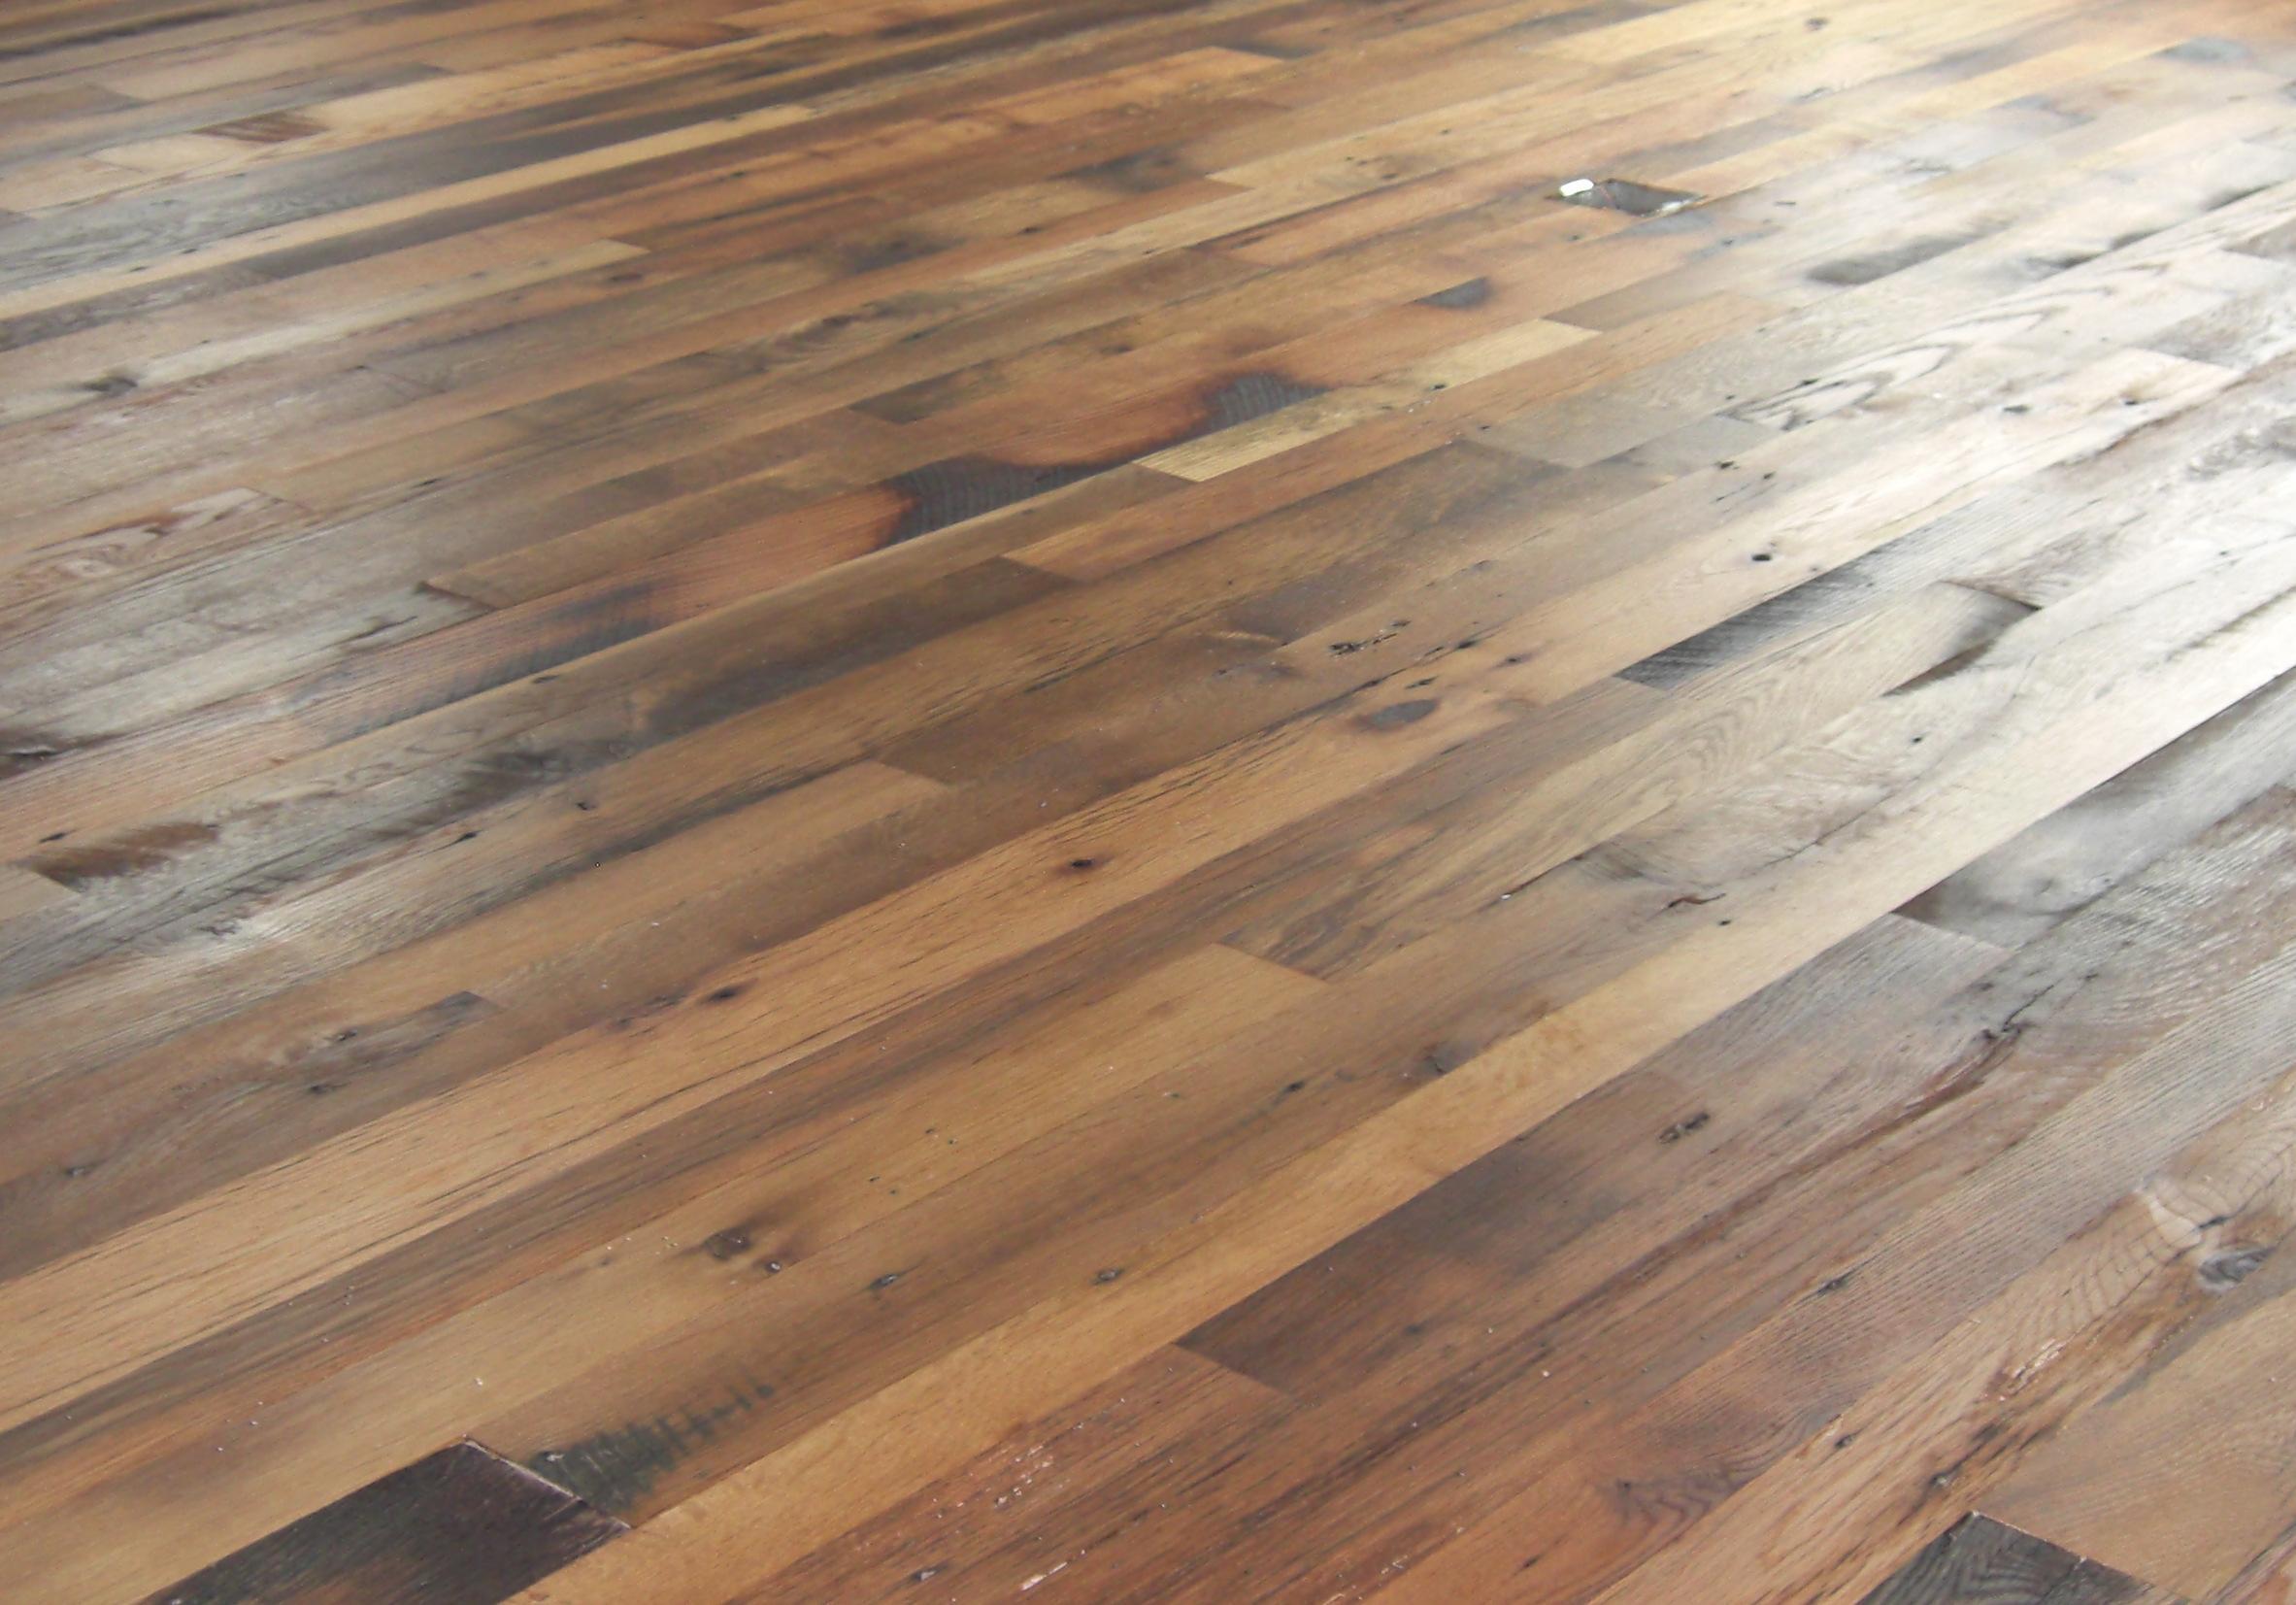 hardwood floor welcome to dembowski hardwood floors ZFCXVTB